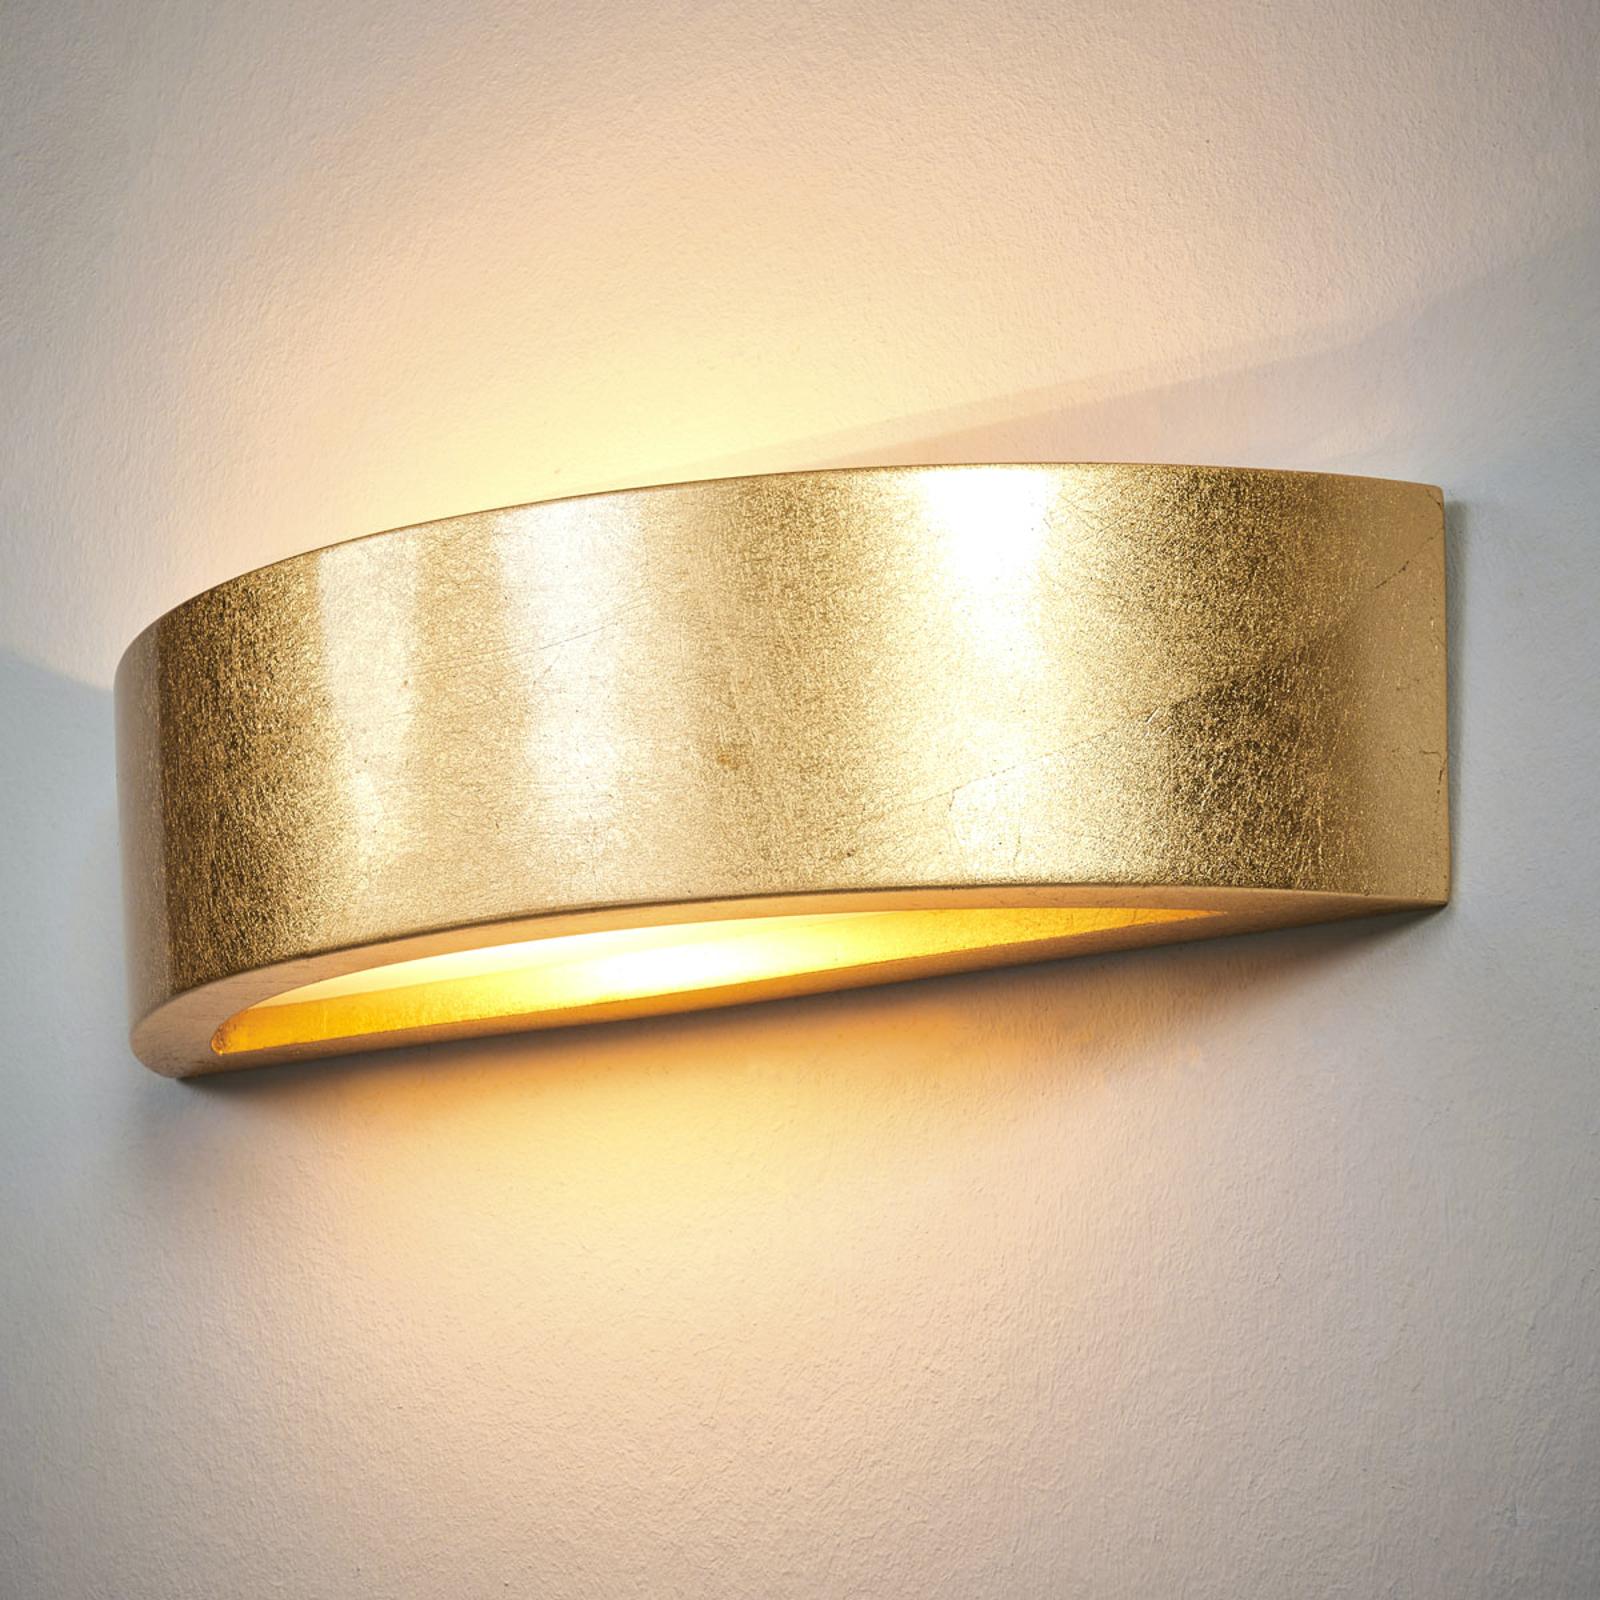 Jasin - wandlamp met gouden oppervlak